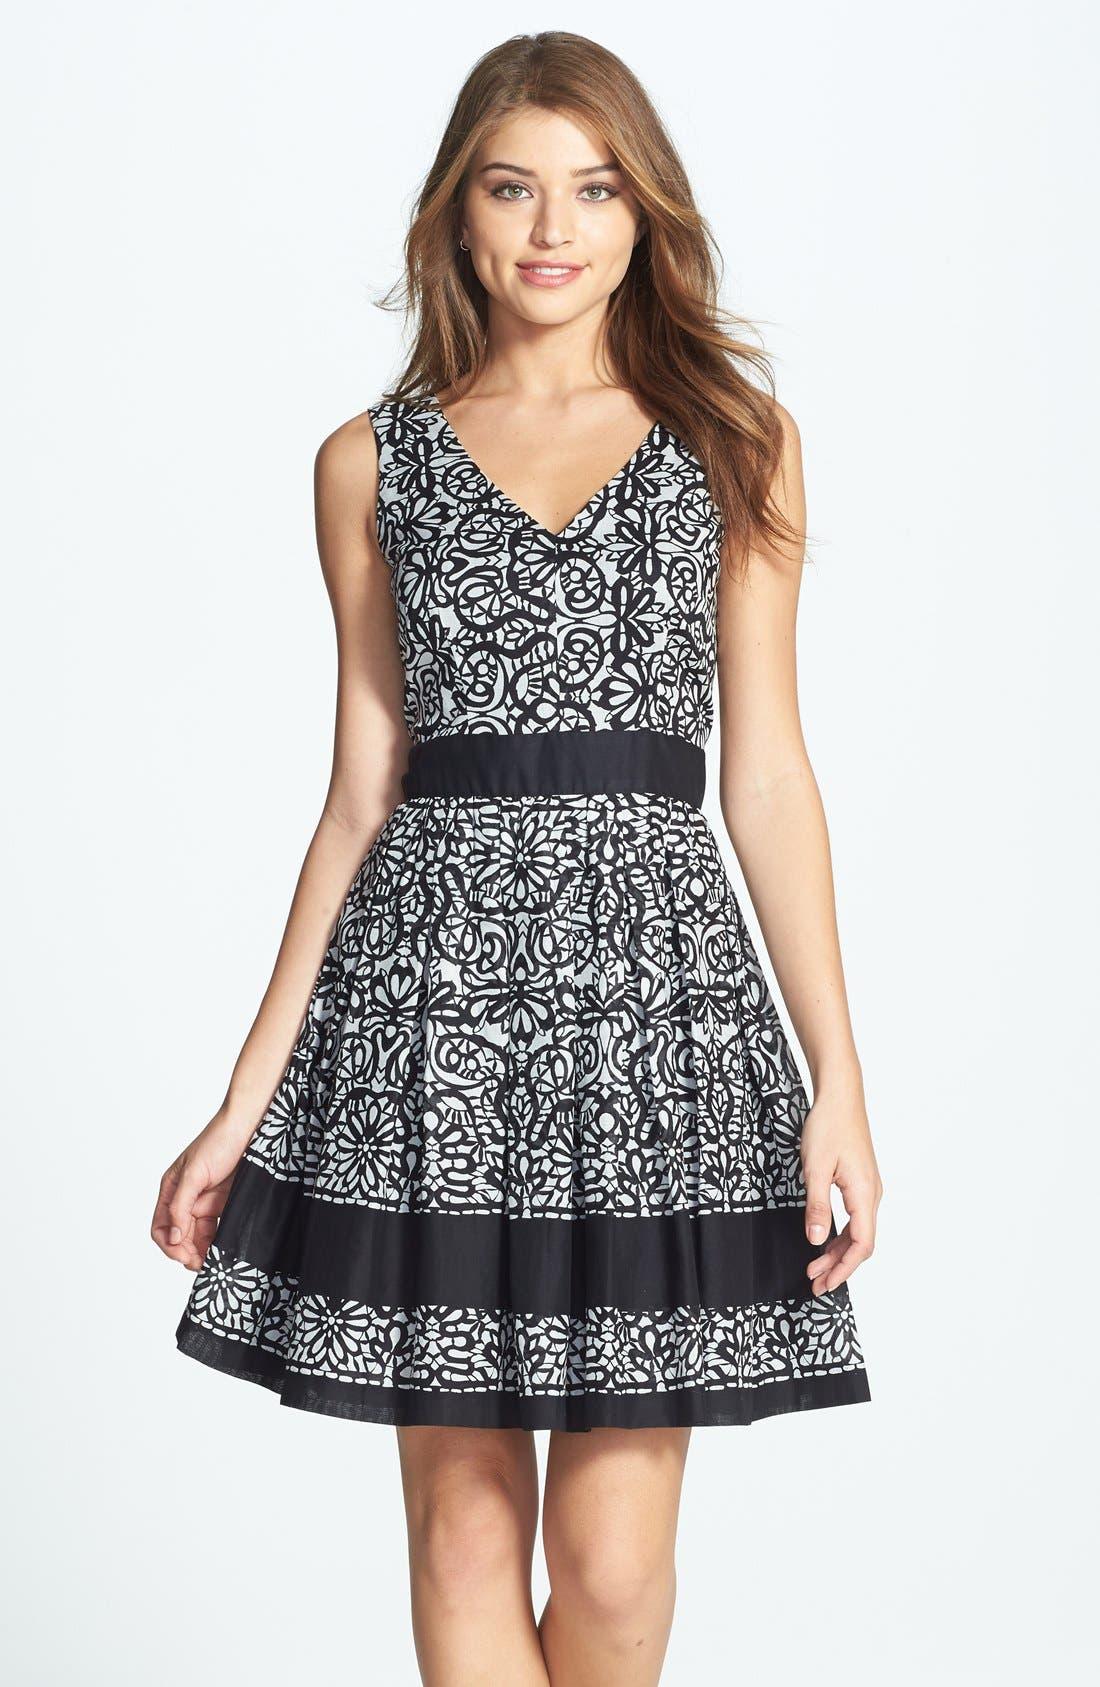 Alternate Image 1 Selected - Taylor Dresses Print Cotton Voile Fit & Flare Dress